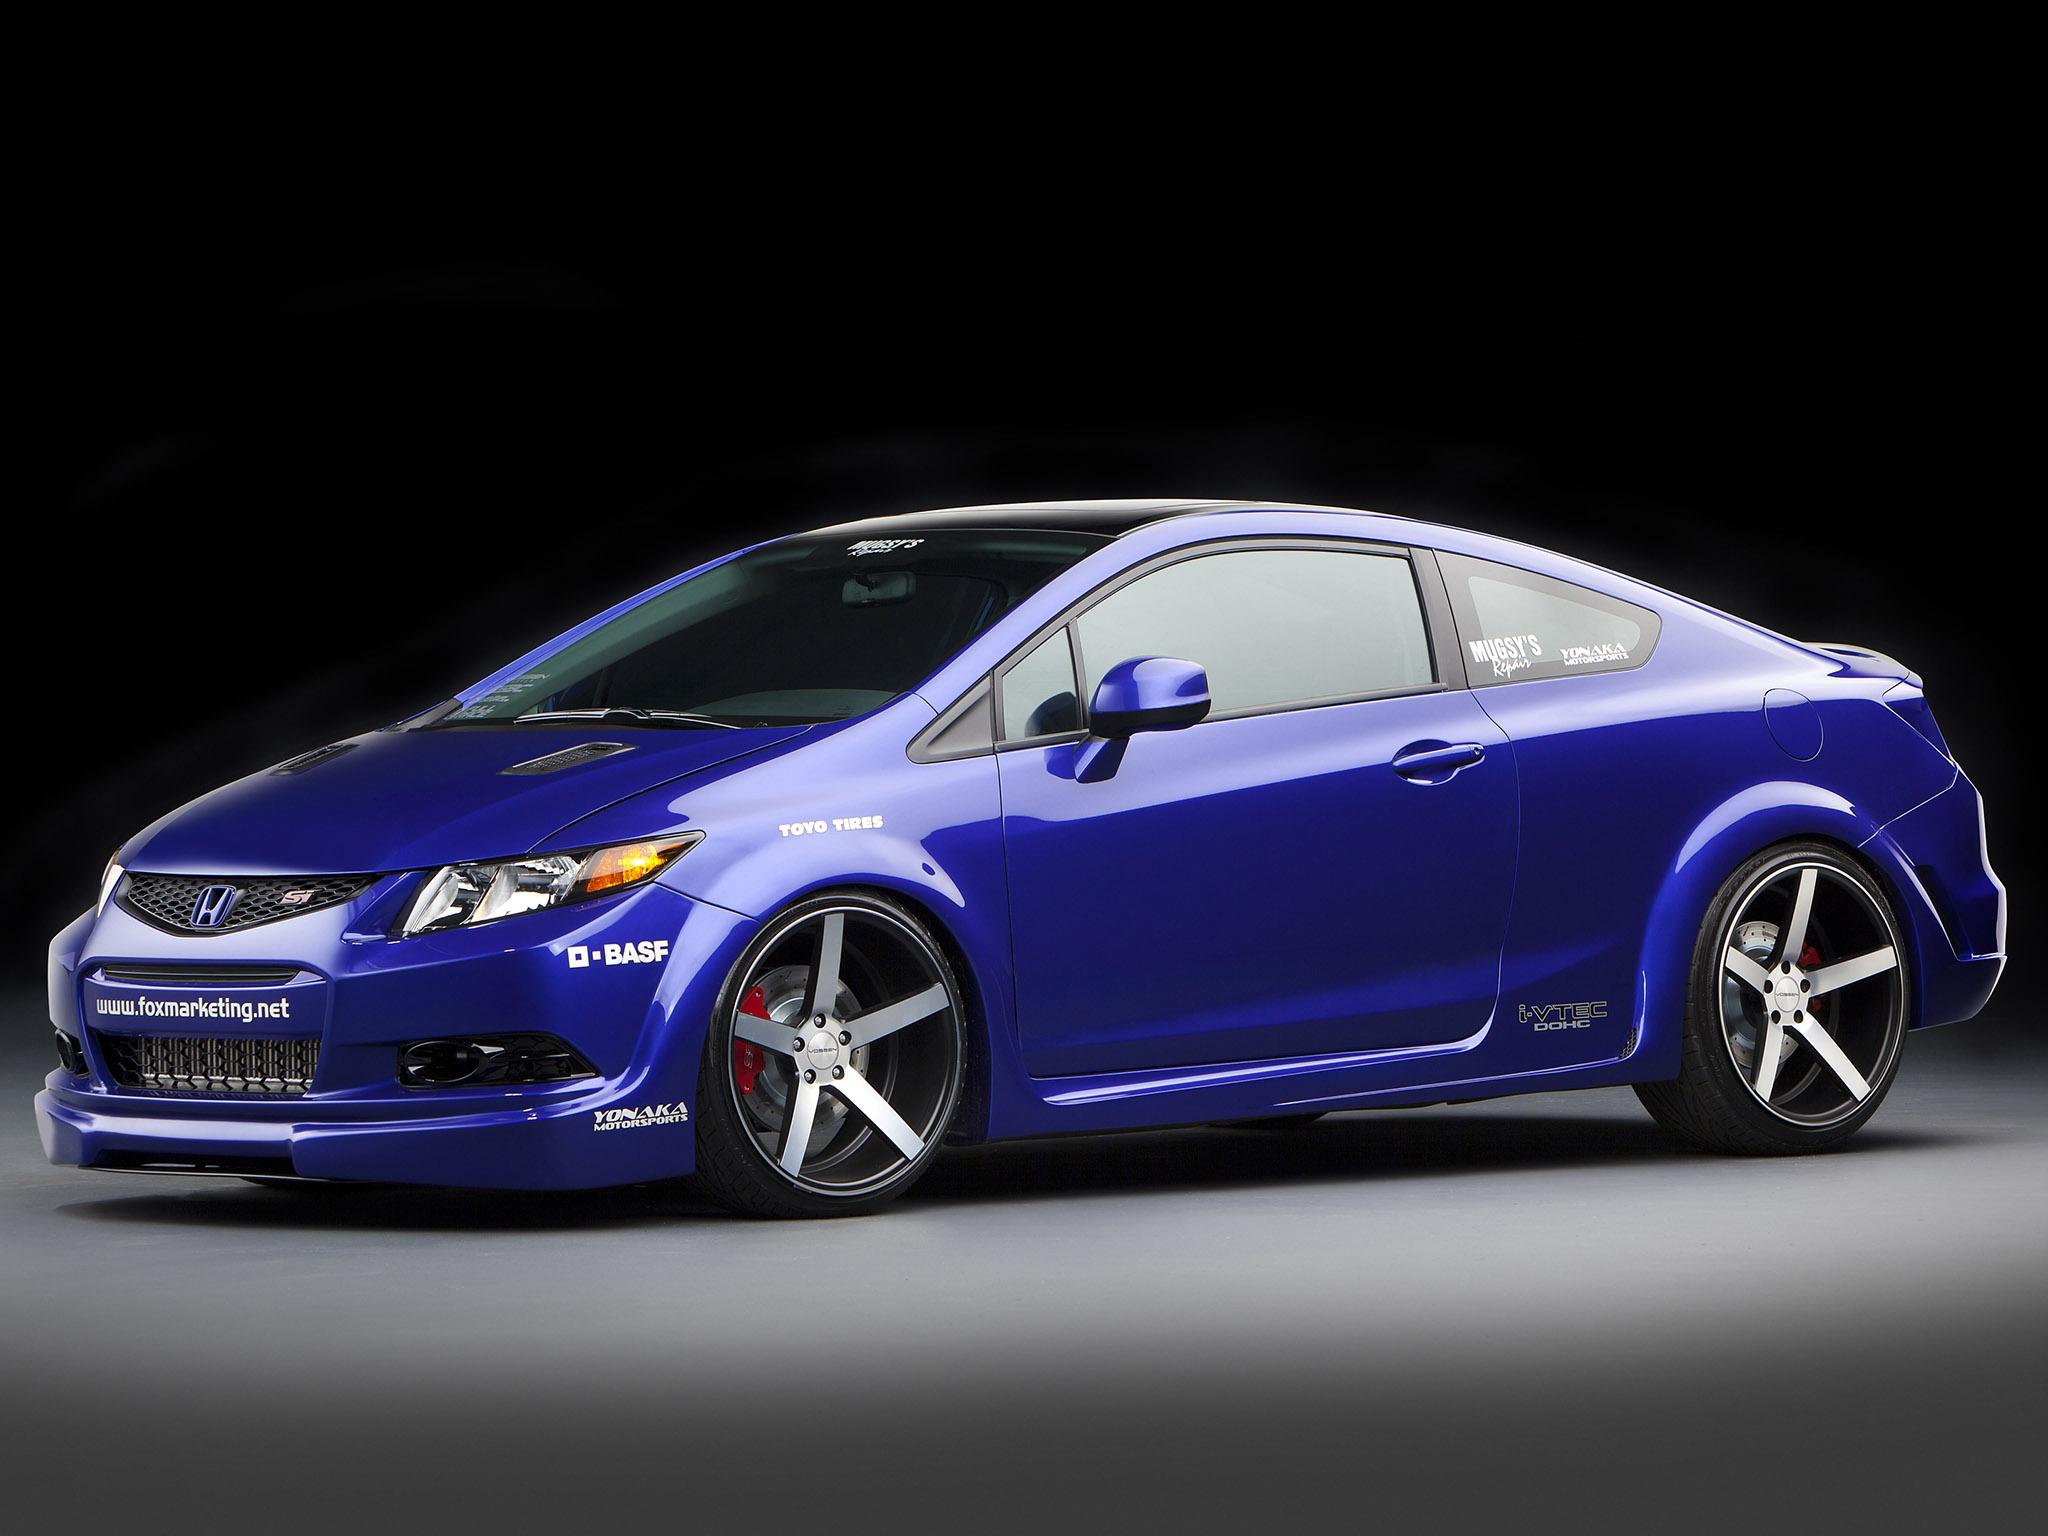 2011 Honda Civic Si Coupe tuning wallpaper  2048x1536  110927